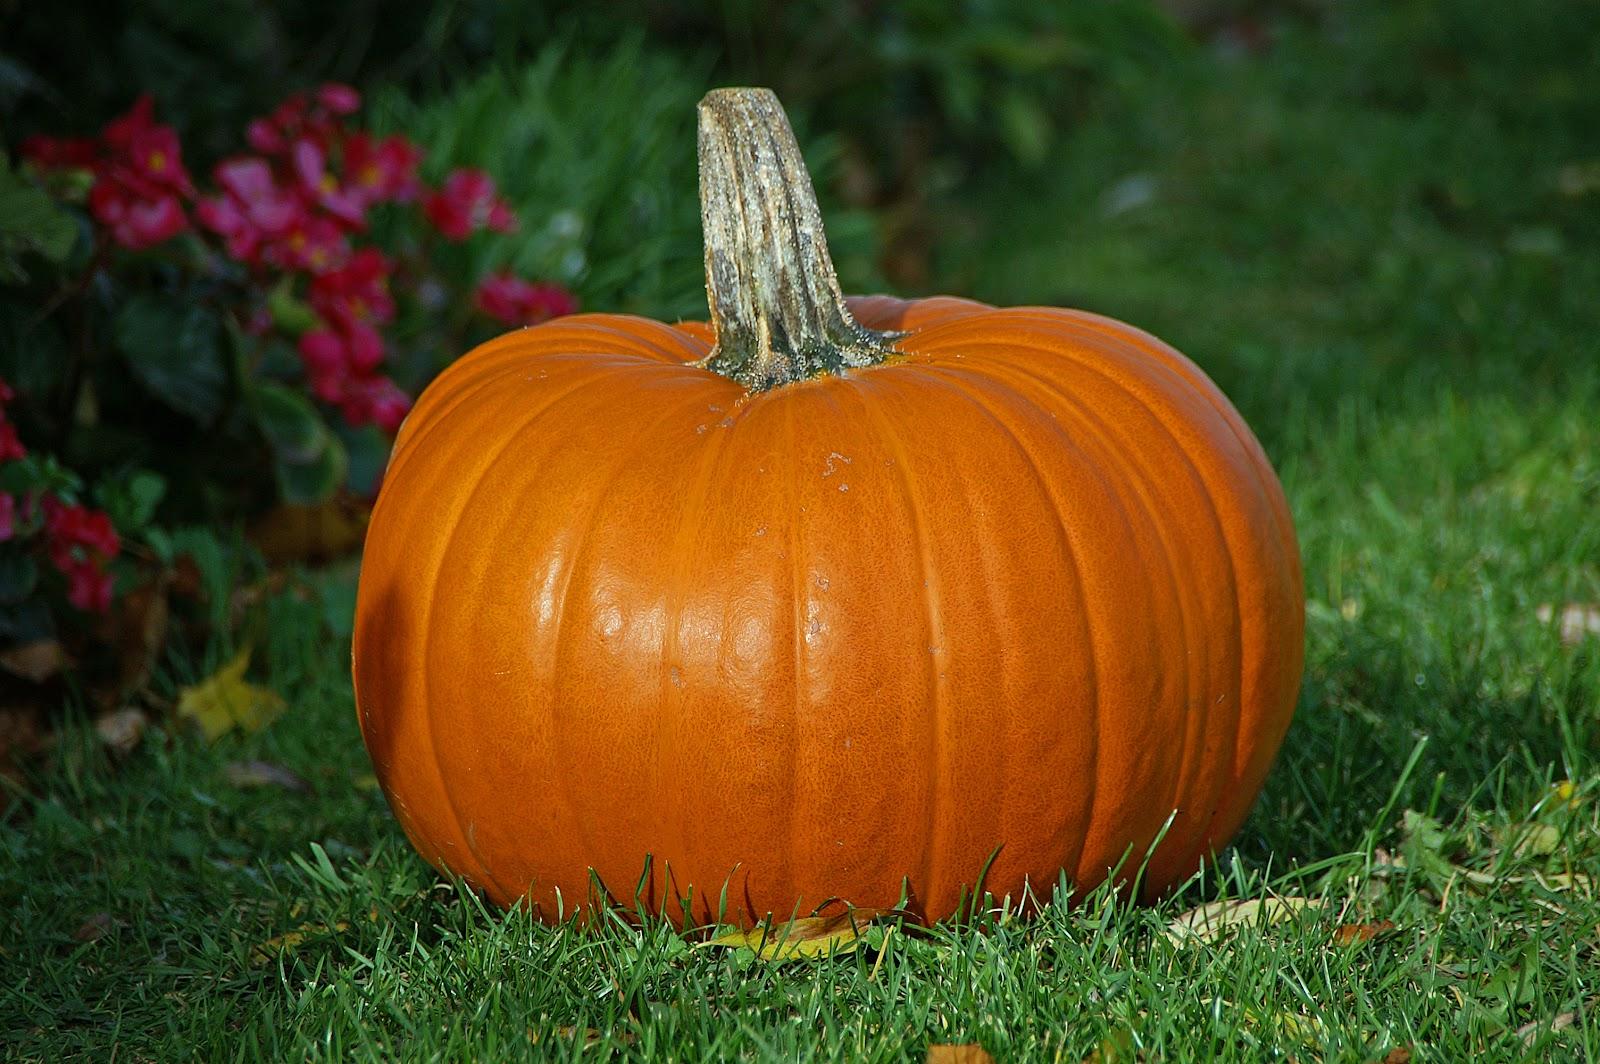 File:Pumpkin.jpg - Wikimedia Commons